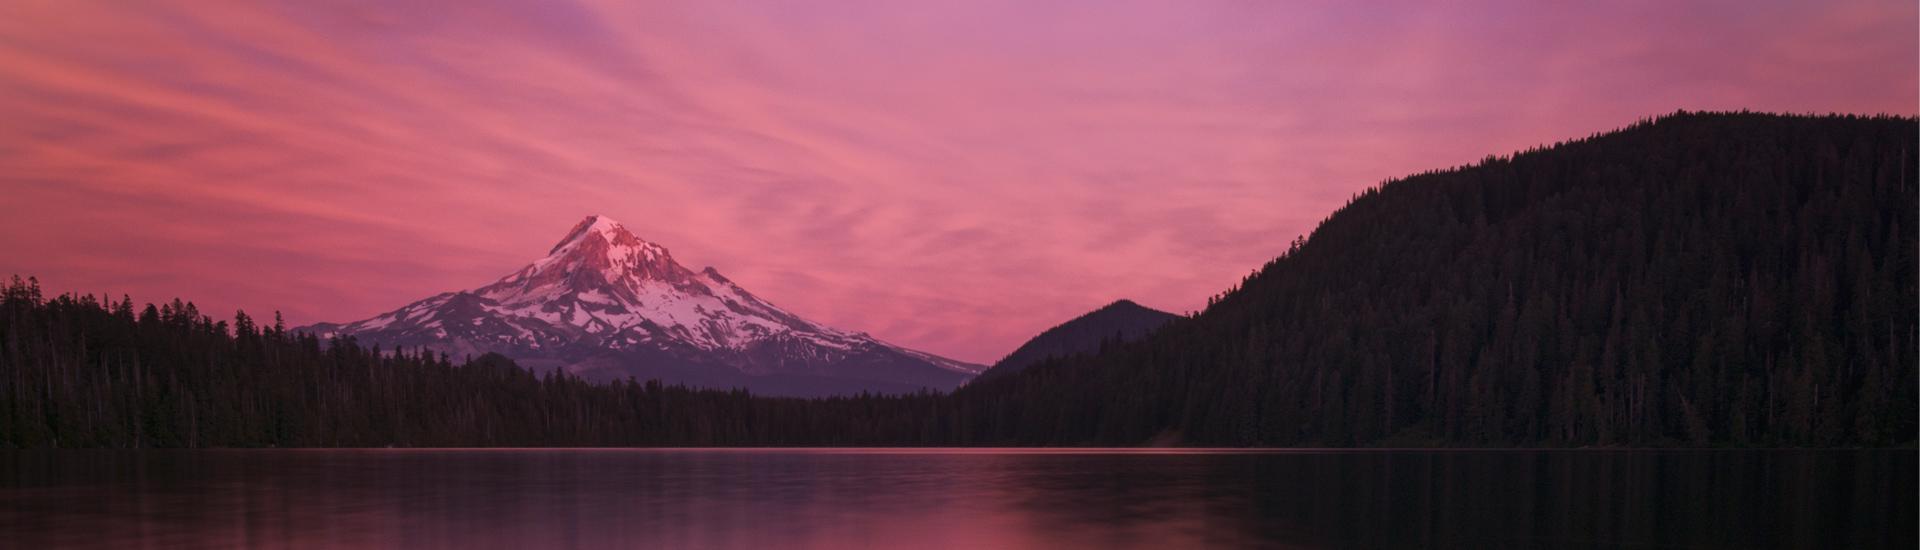 Lost Lake by Daniel Gomez